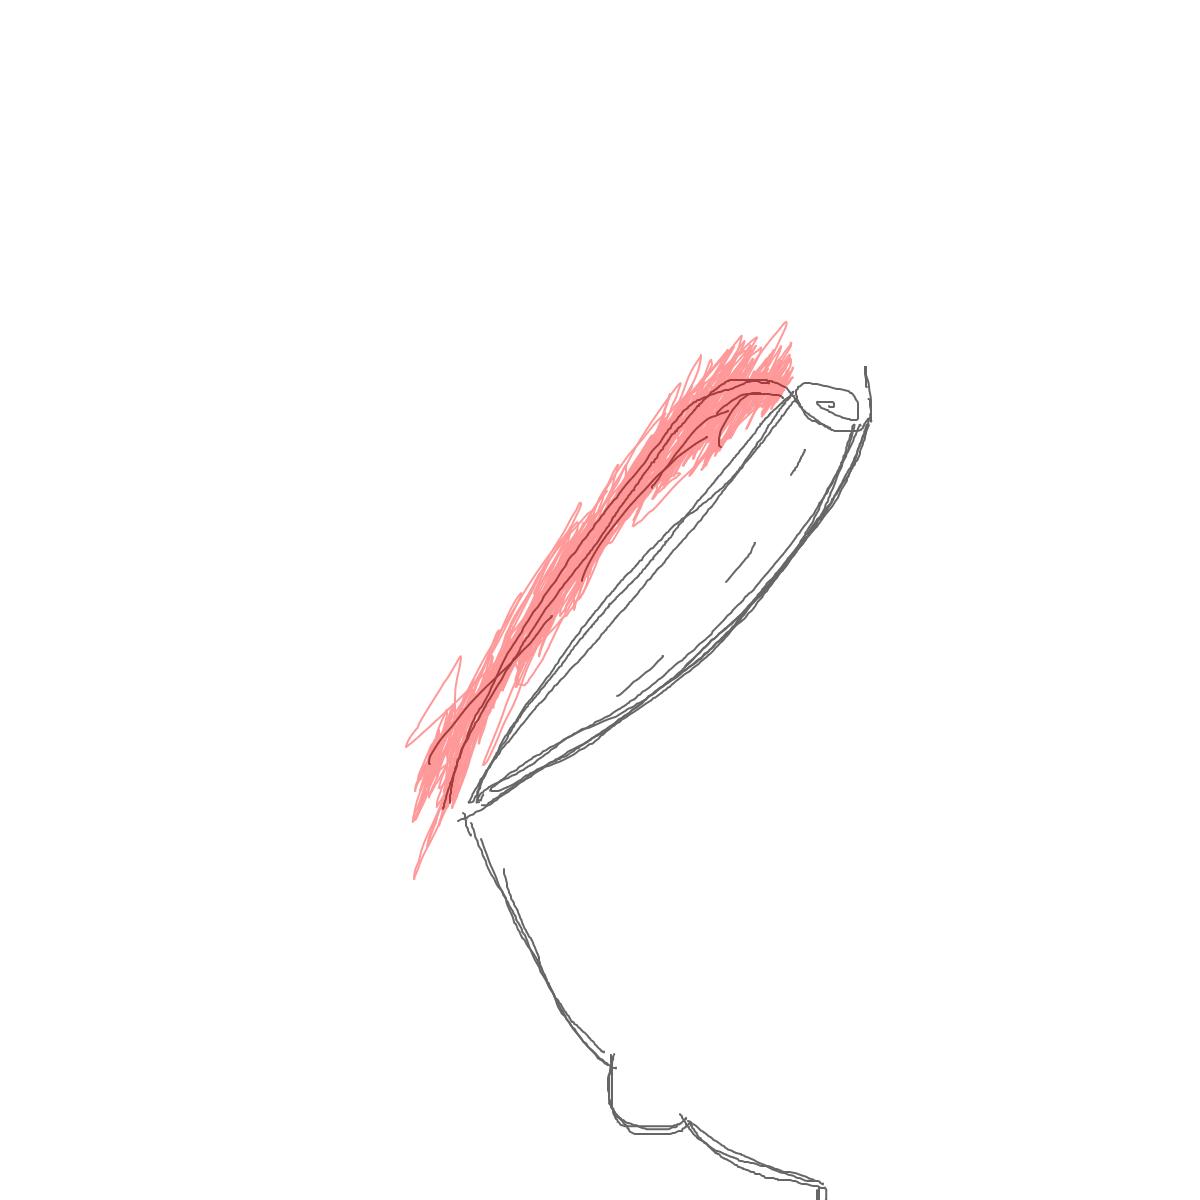 BAAAM drawing#10726 lat:51.0363159179687500lng: -114.0524368286132800